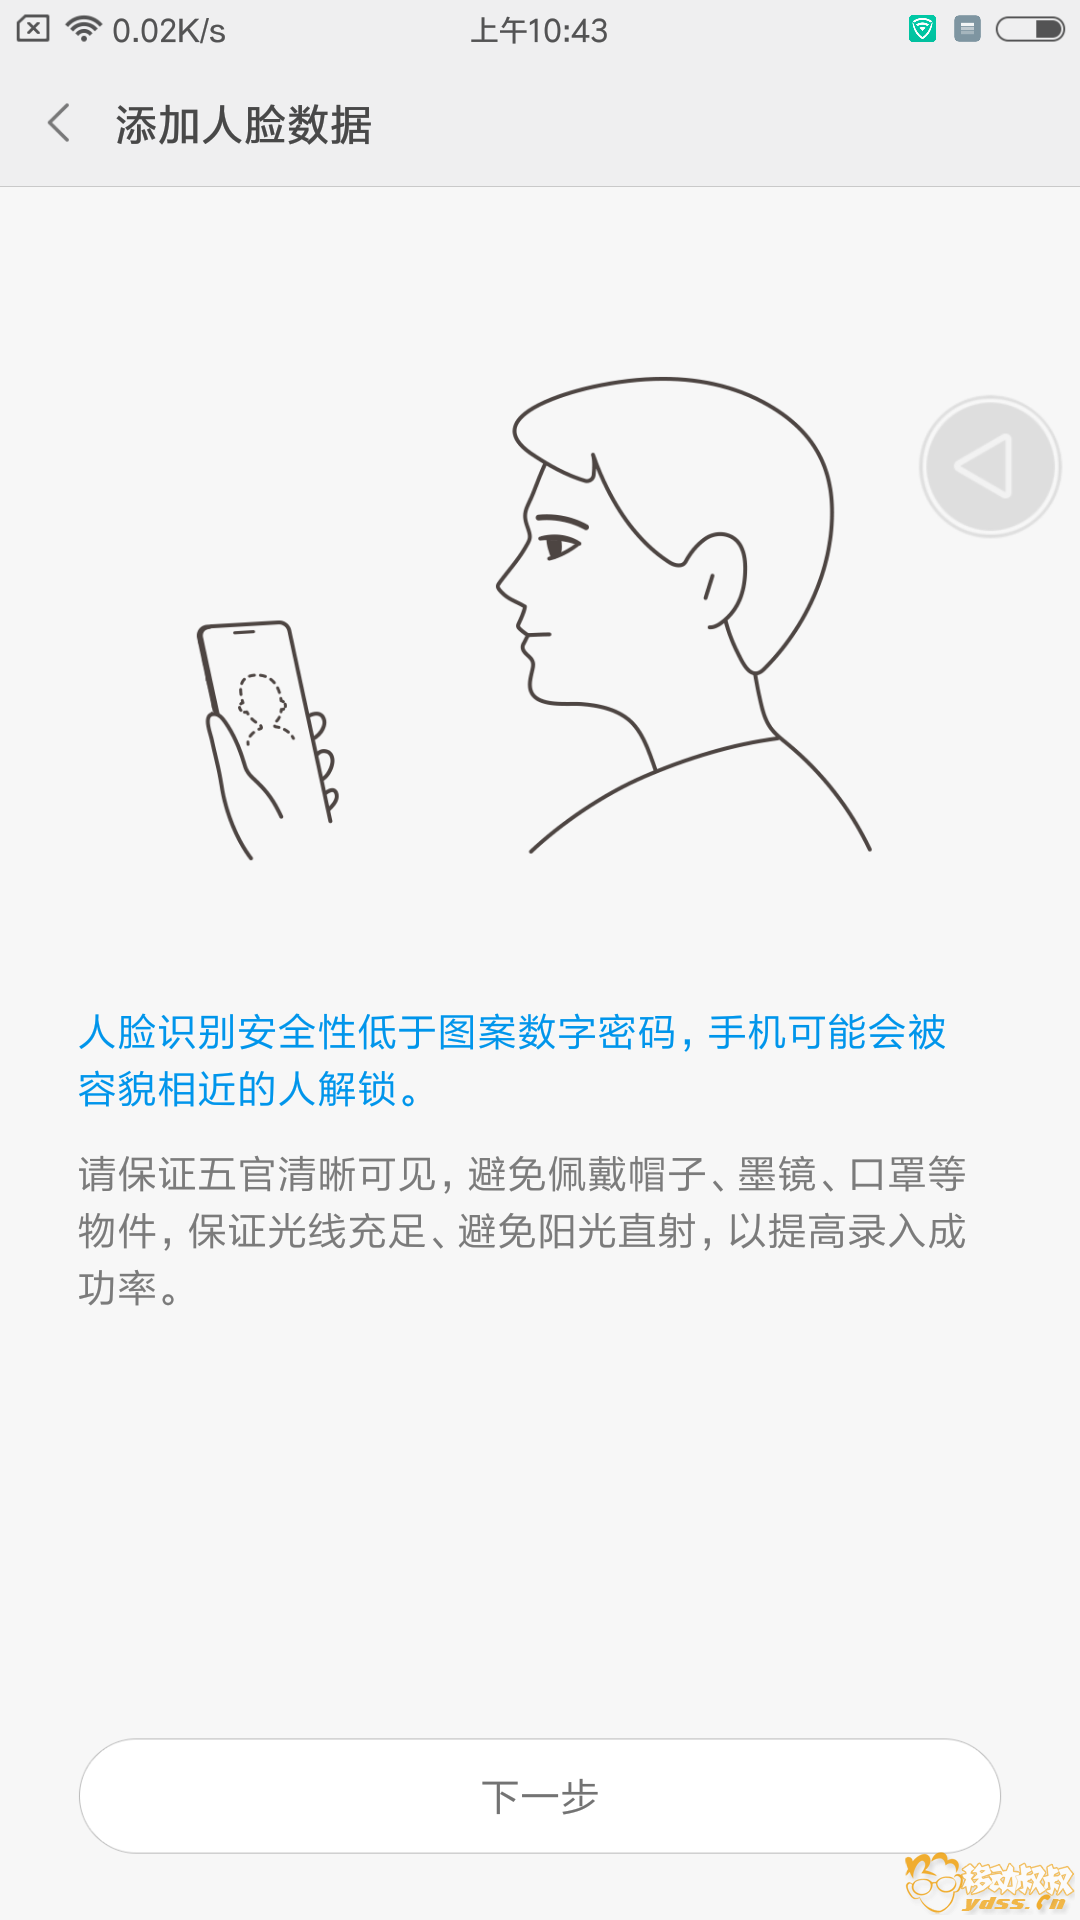 Screenshot_2017-12-18-10-43-46-086_com.android.keyguard.png